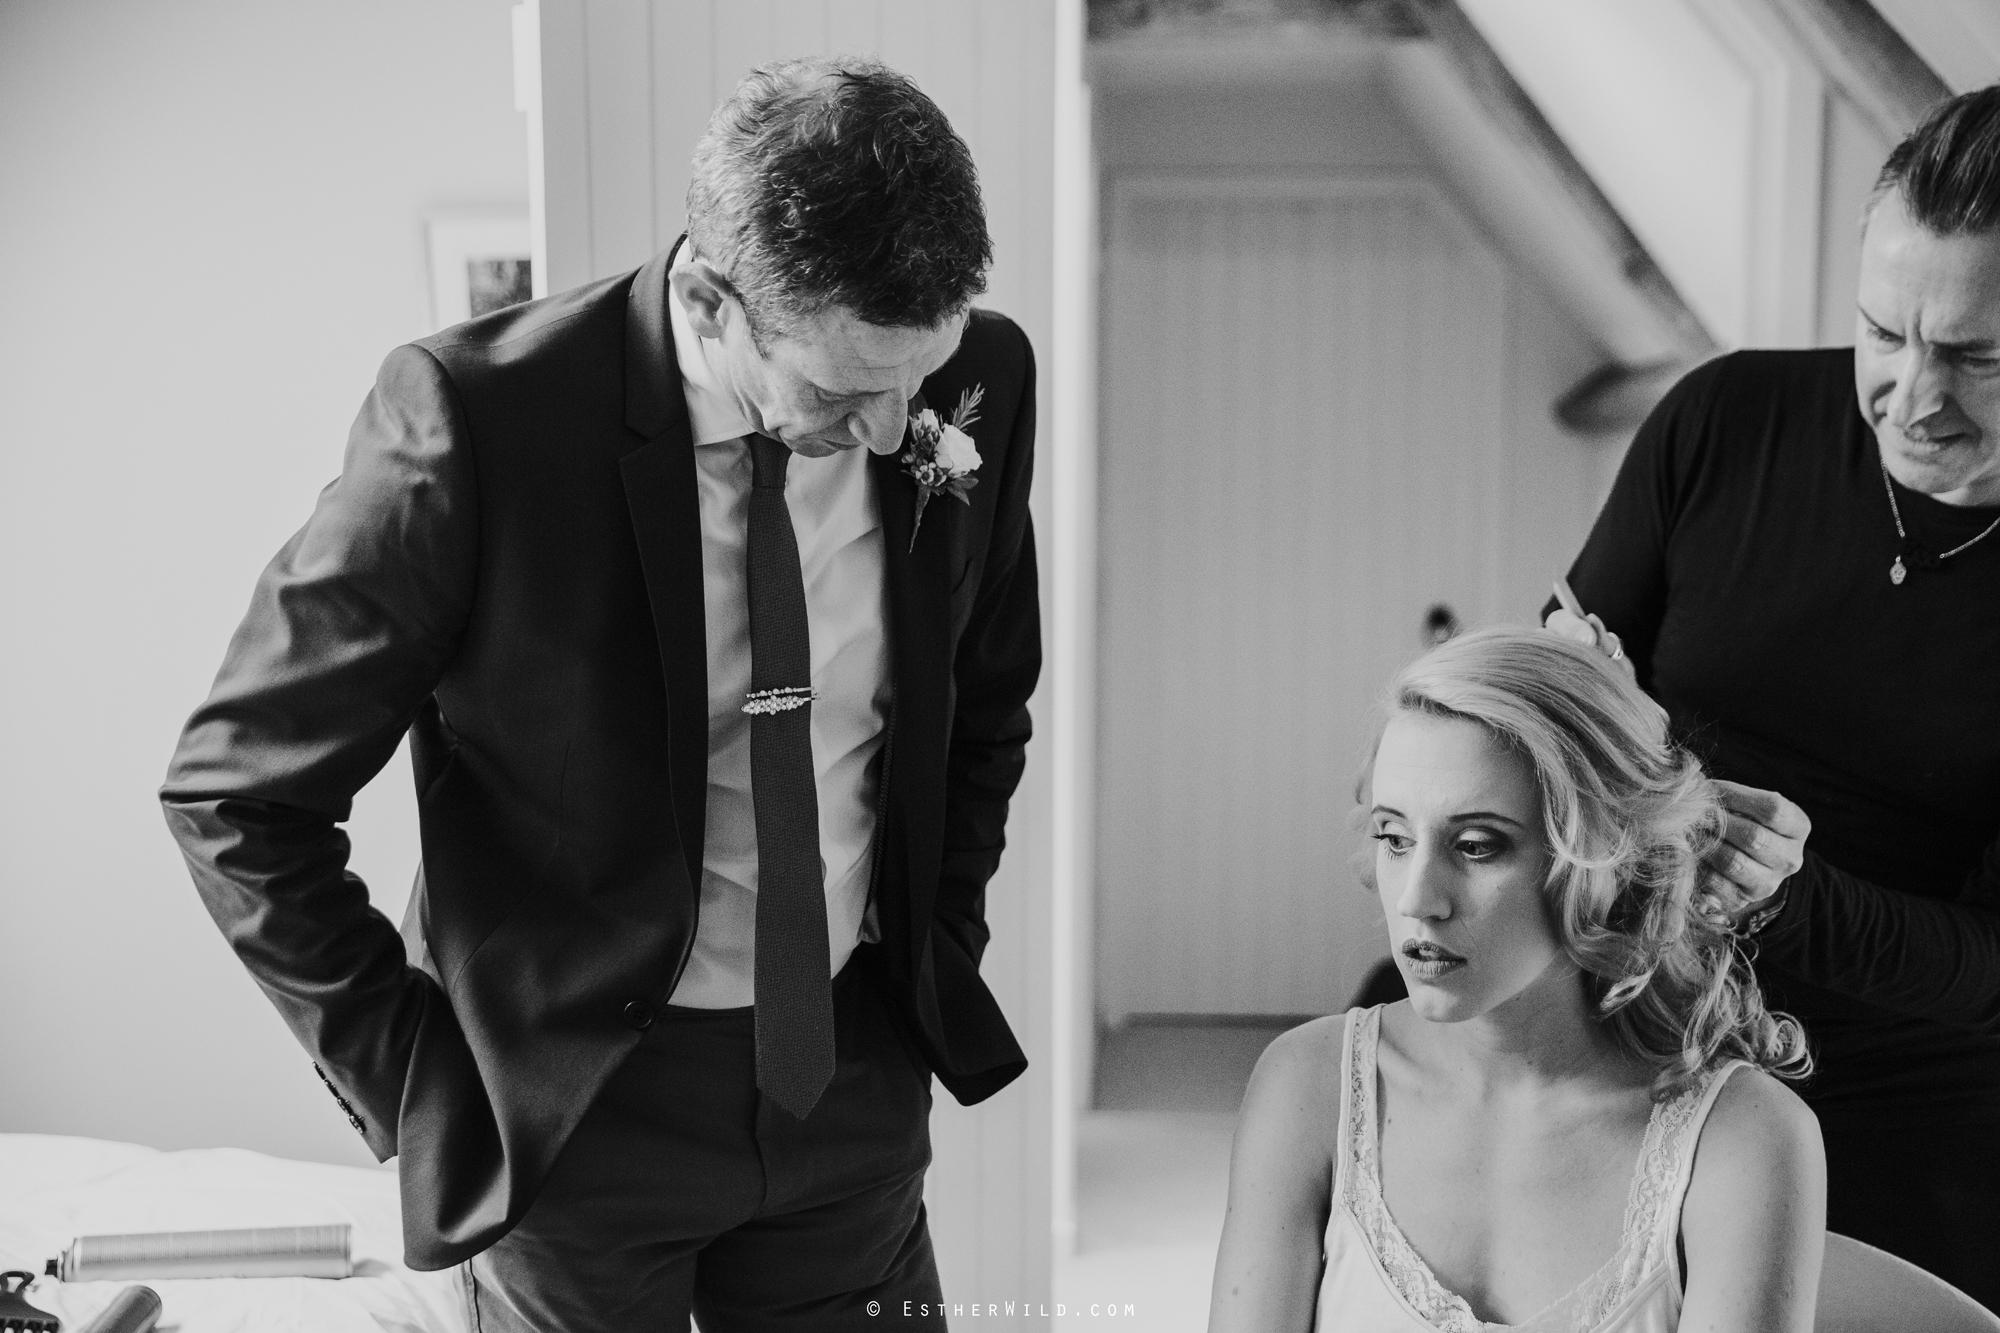 Elms_Barn_Weddings_Suffolk_Photographer_Copyright_Esther_Wild_IMG_0806-2.jpg